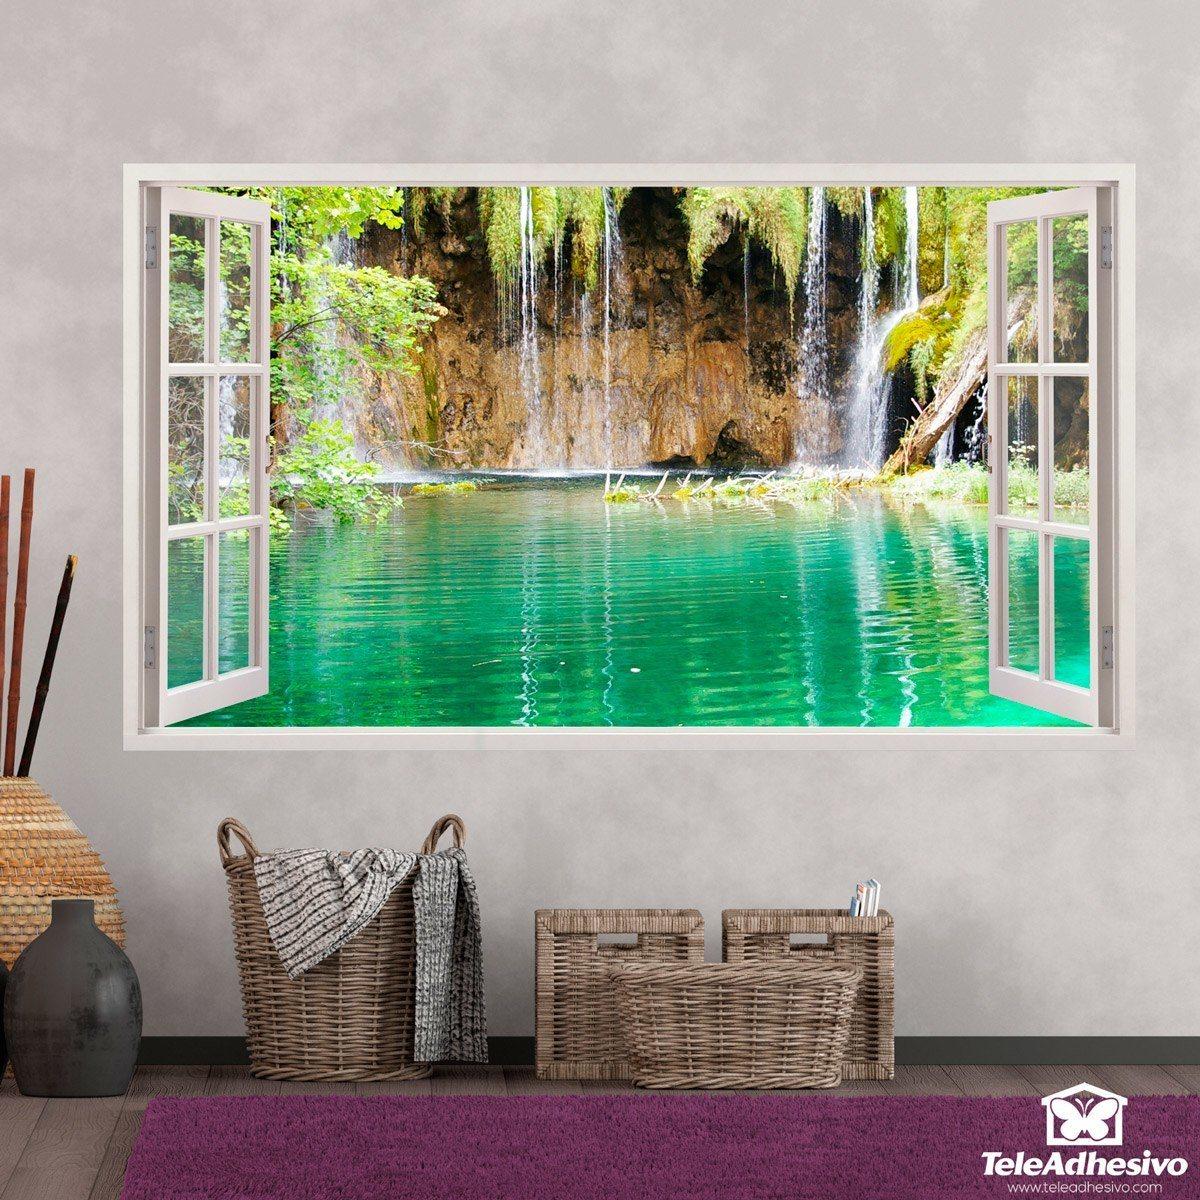 Wandtattoos: Panorama See und Wasserfall